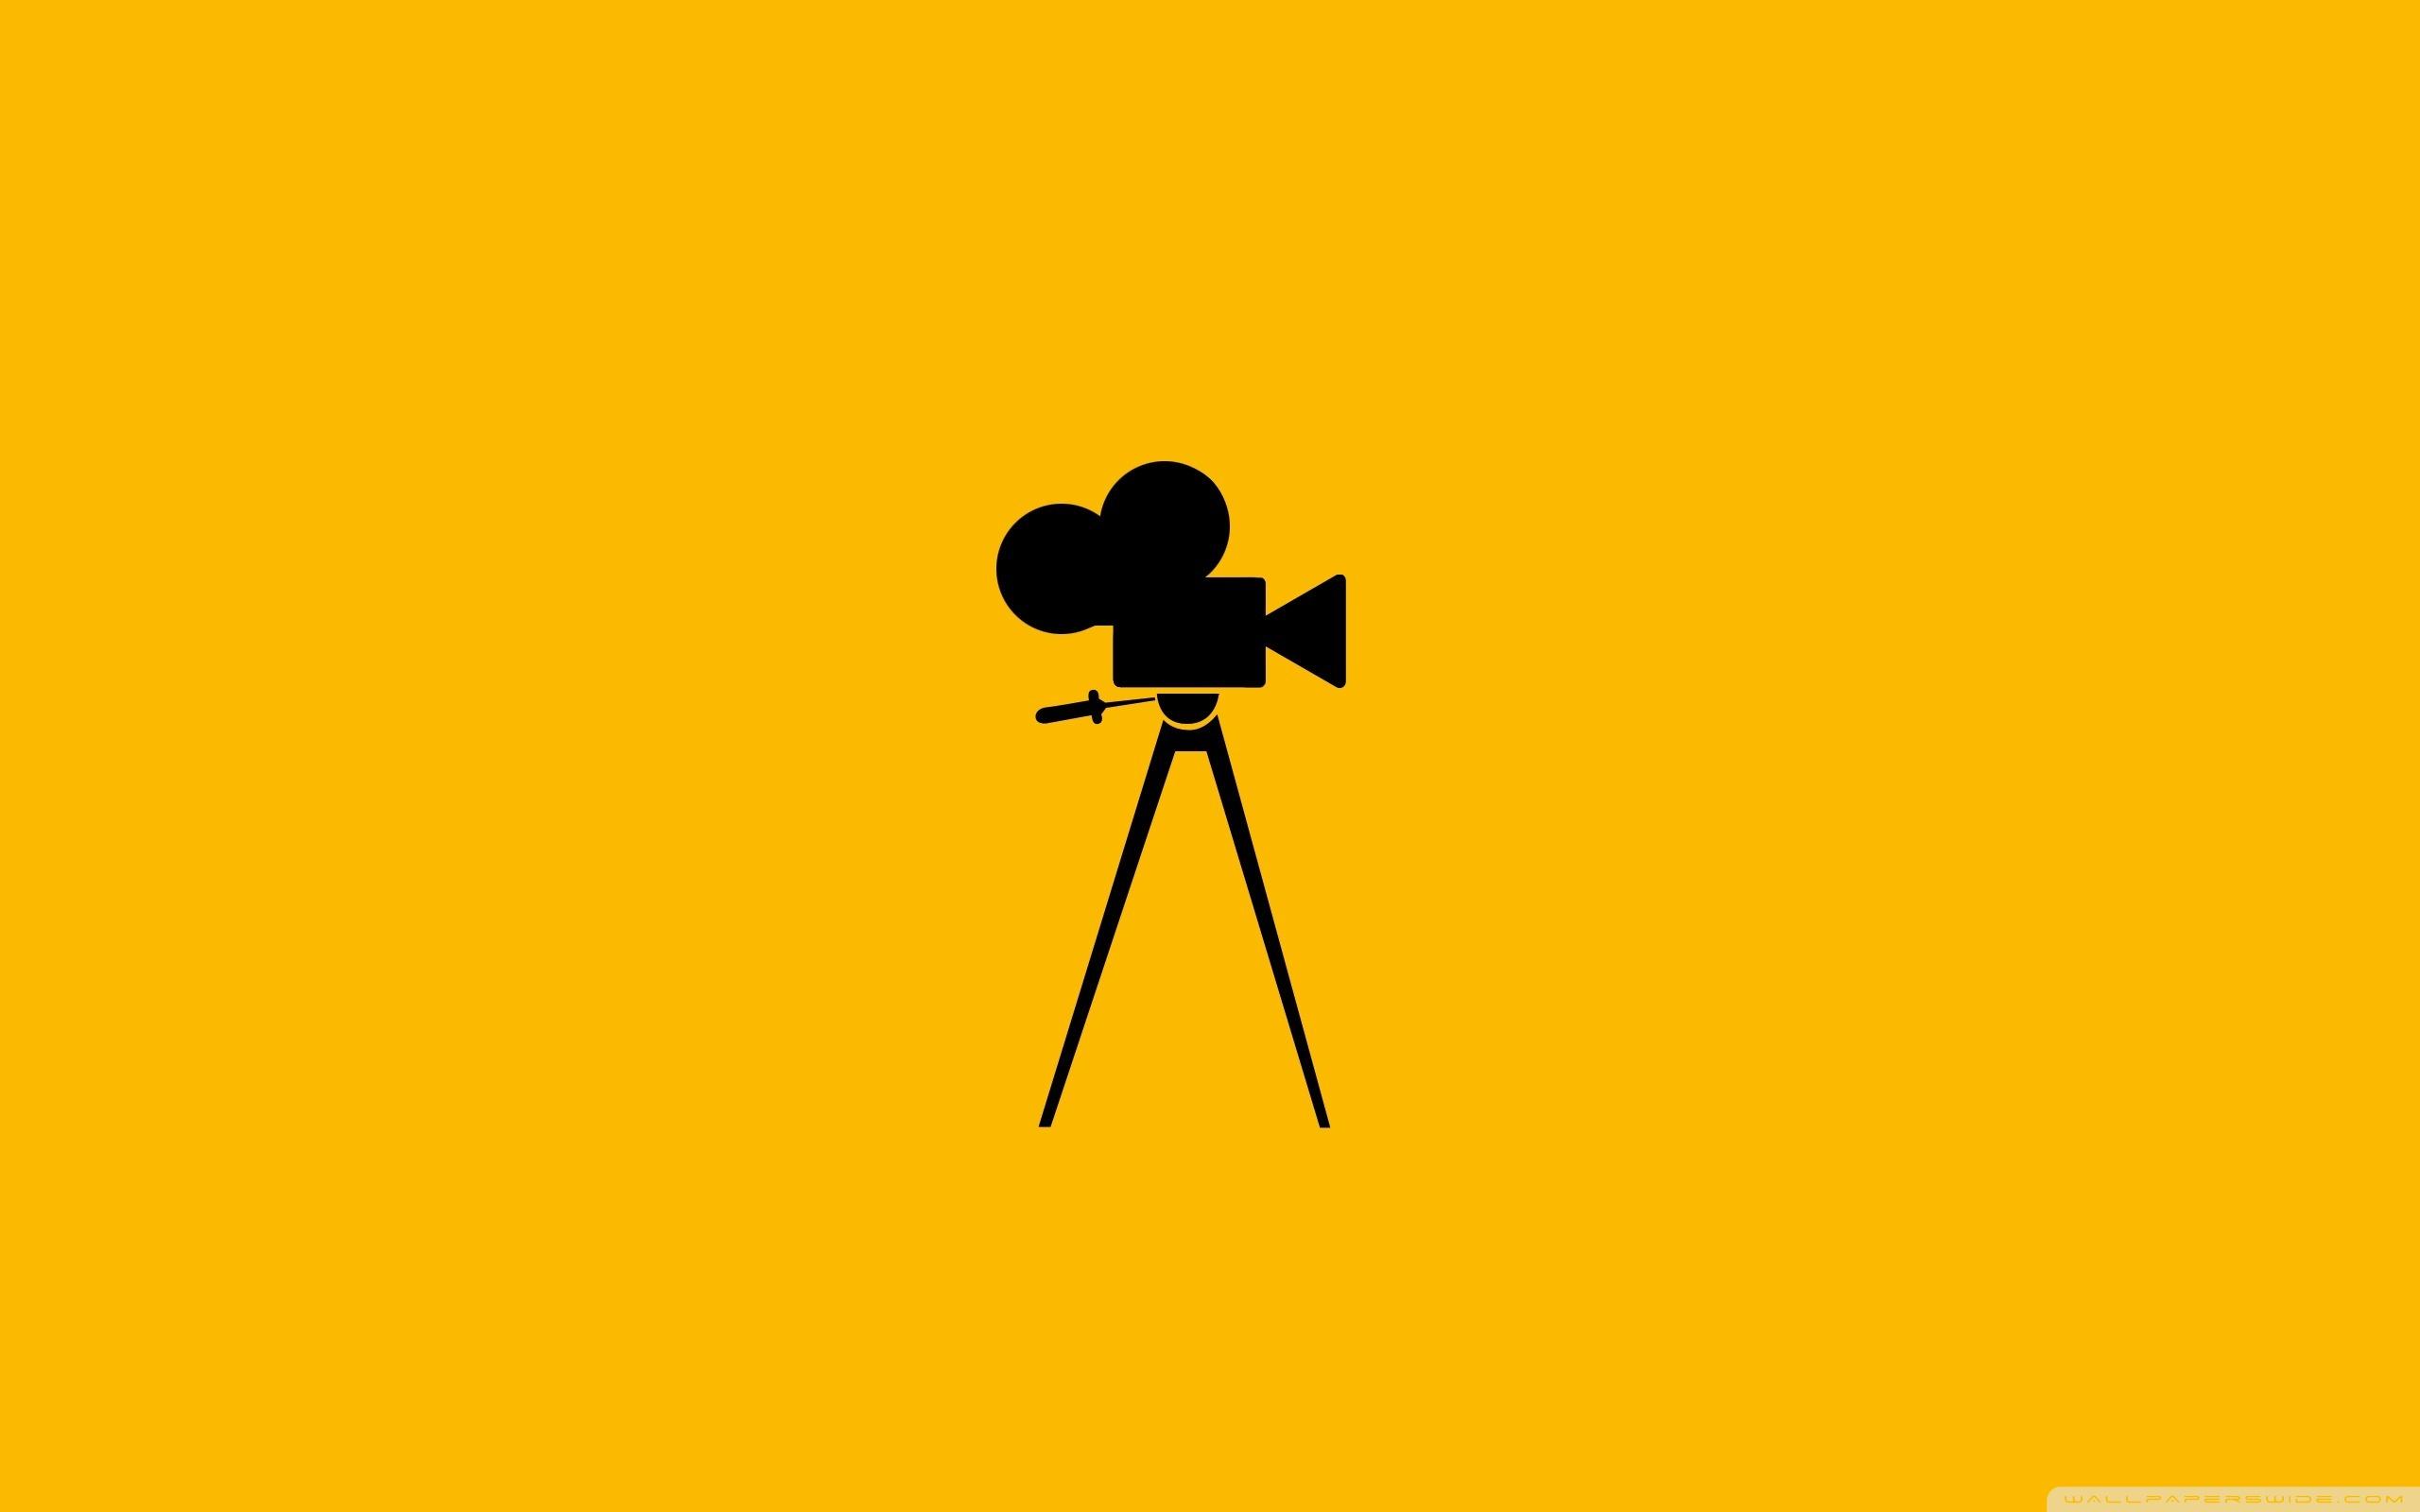 Film Camera Ultra HD Desktop Background Wallpaper for 4K UHD TV 2560x1600